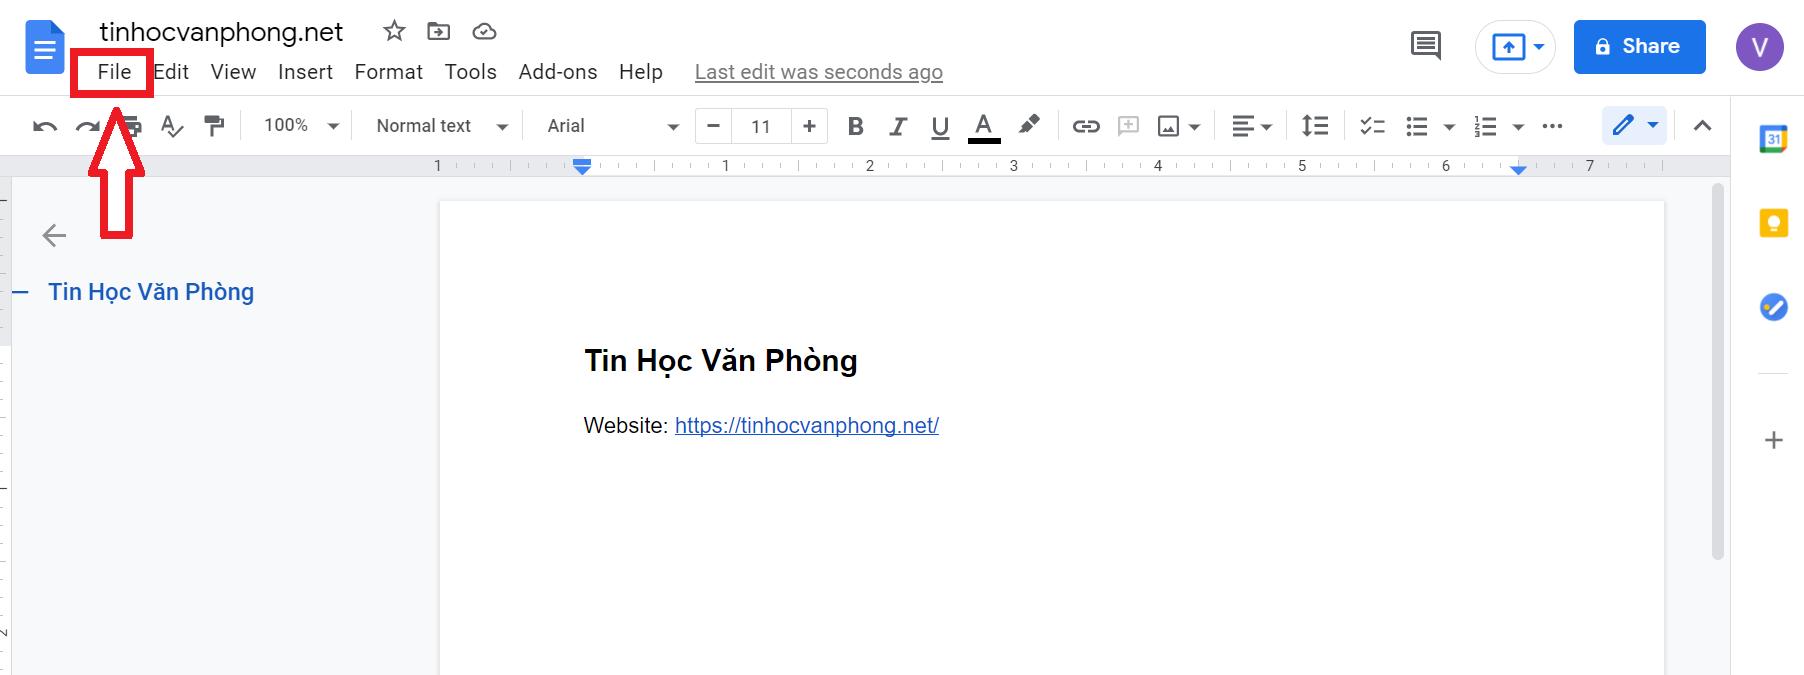 hướng dẫn cách tải file google doc